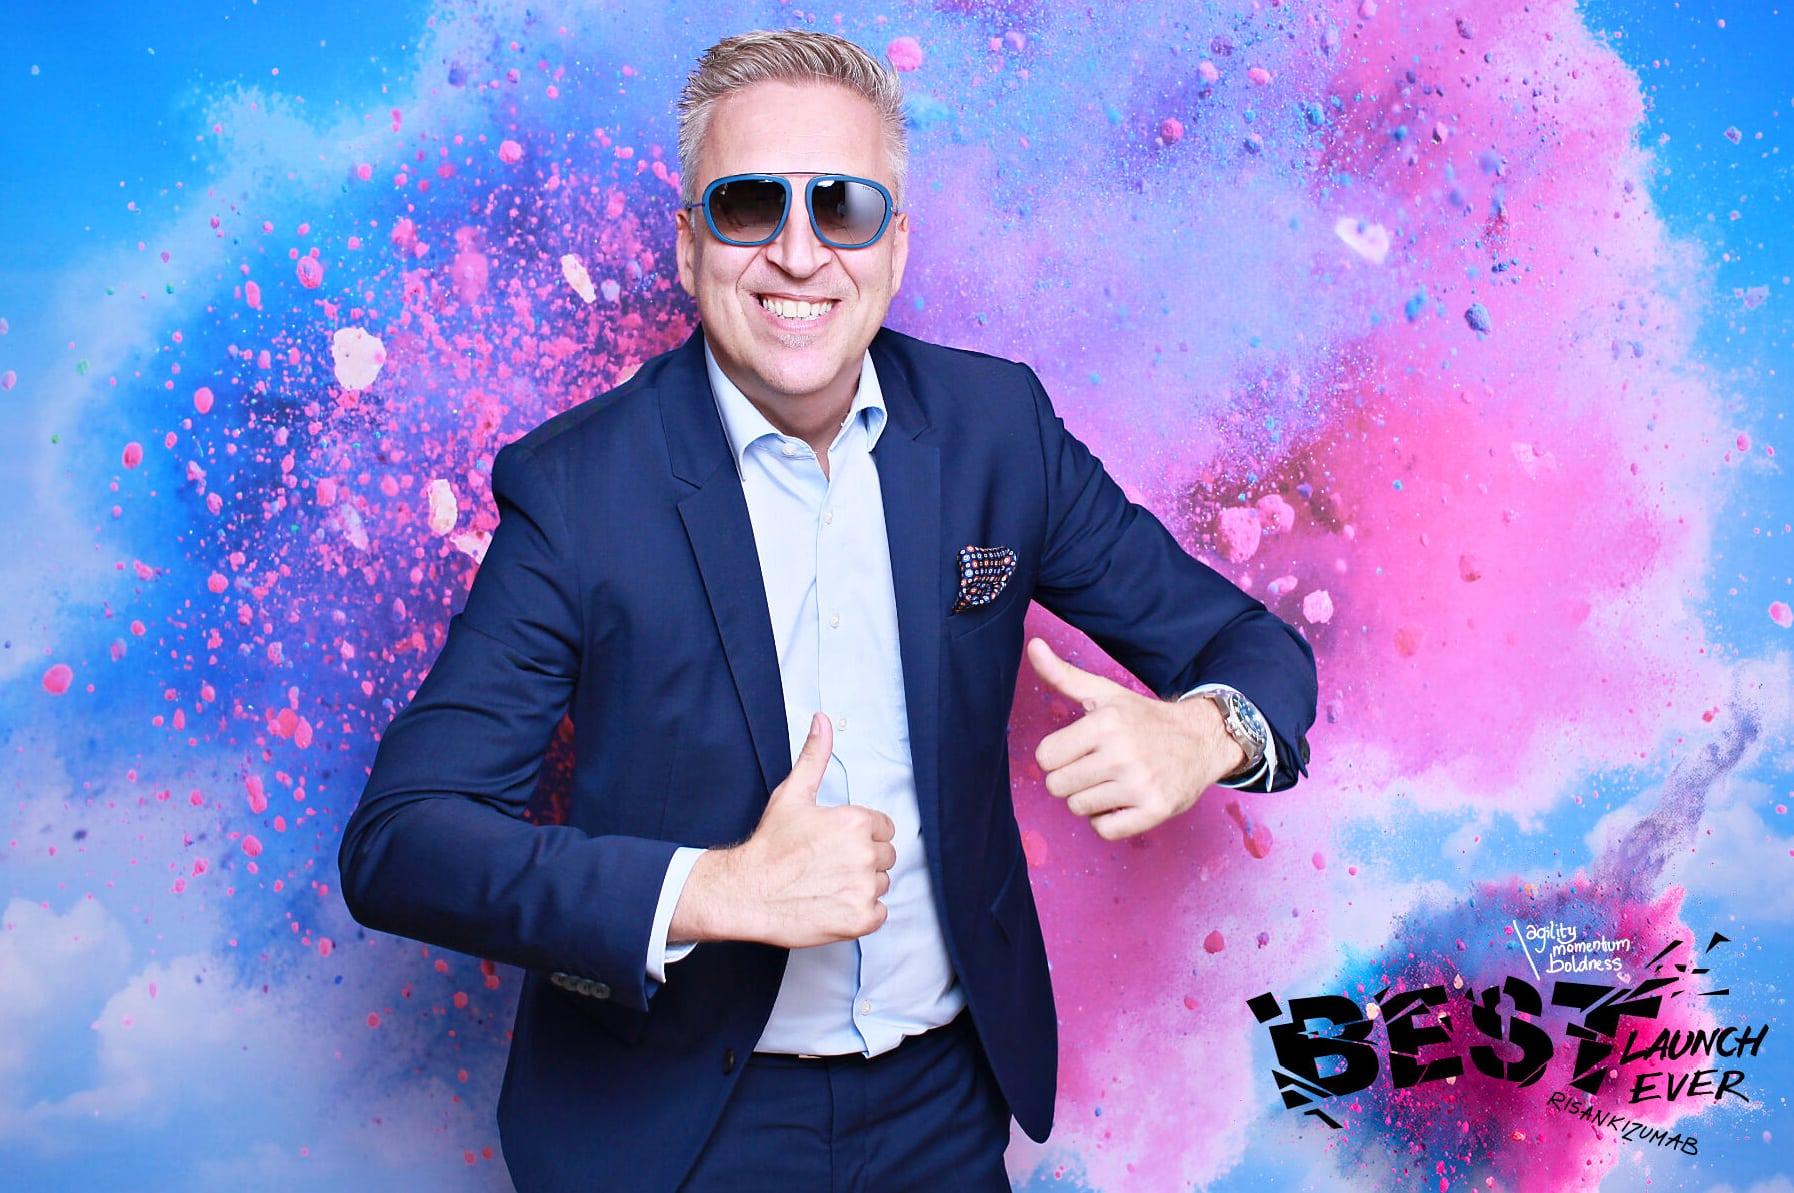 fotokoutek-best-launch-ever-26-6-2018-445702